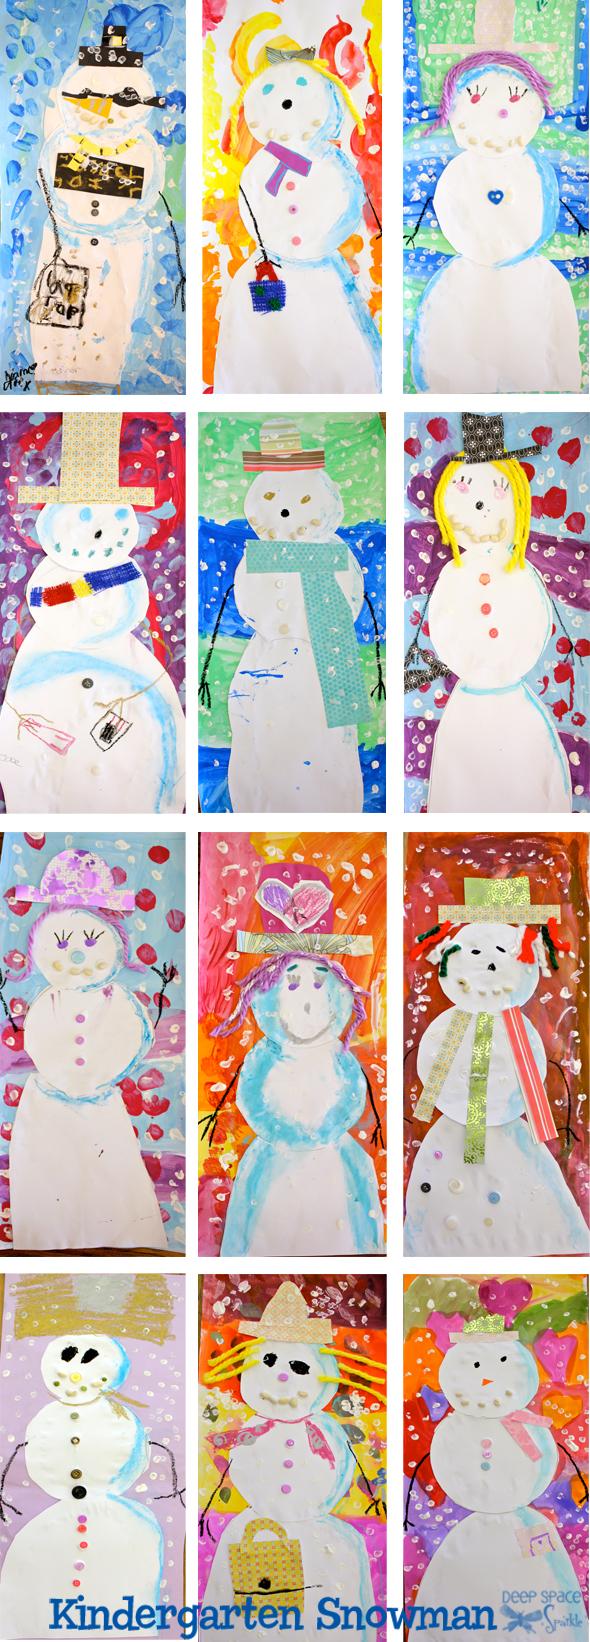 snowman-craft-project